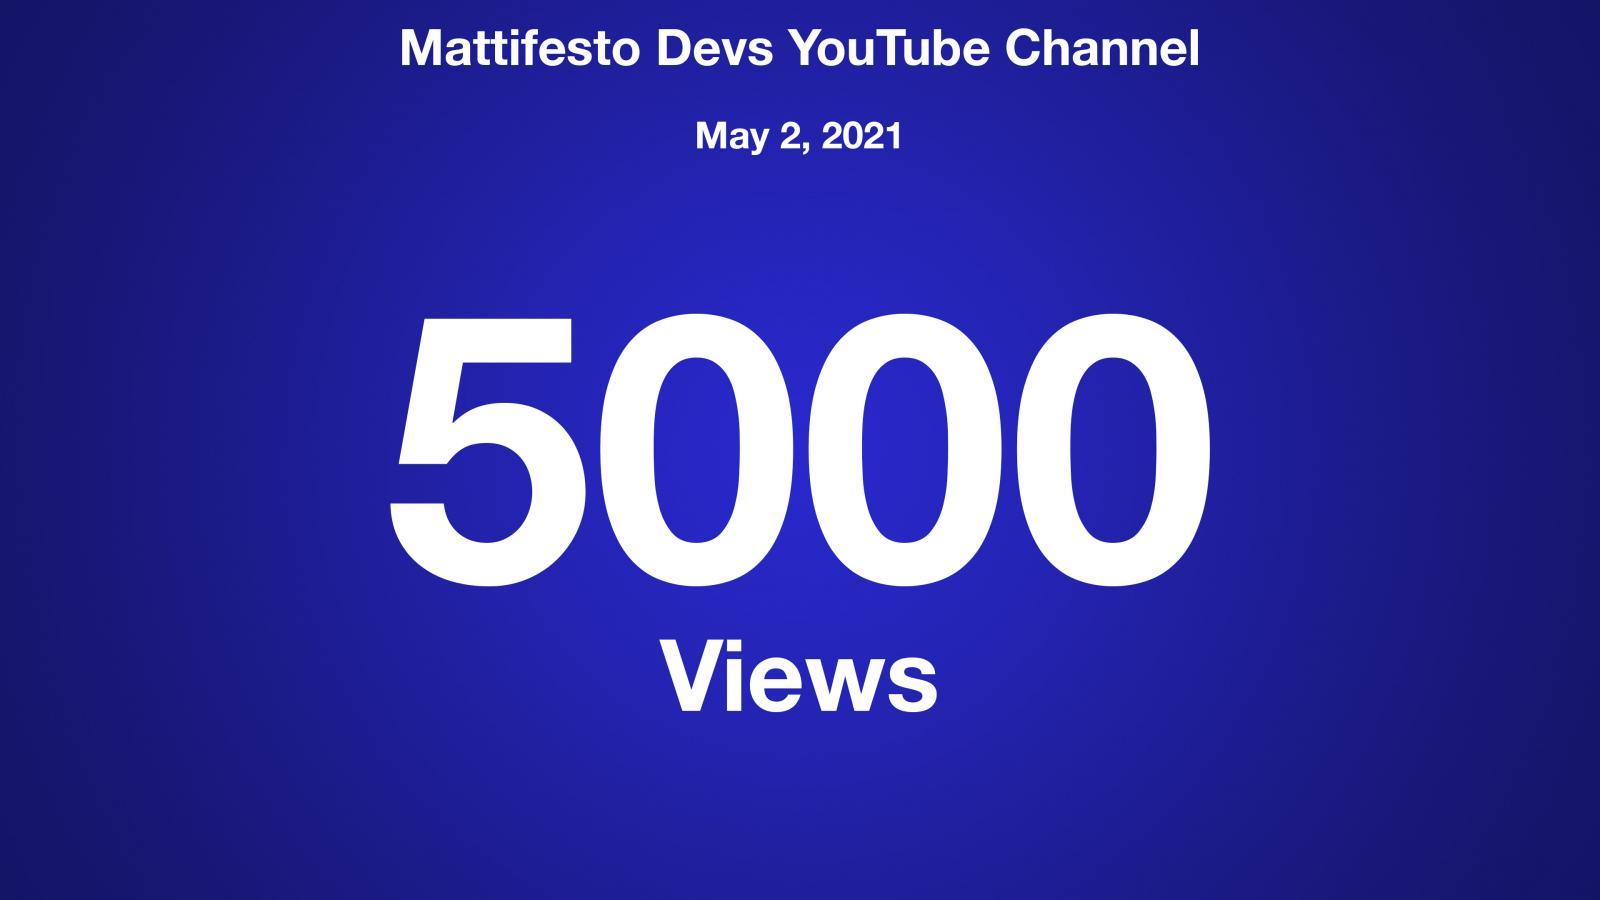 Mattifesto Devs YouTube Channel, May 2 2021, 5000 Views